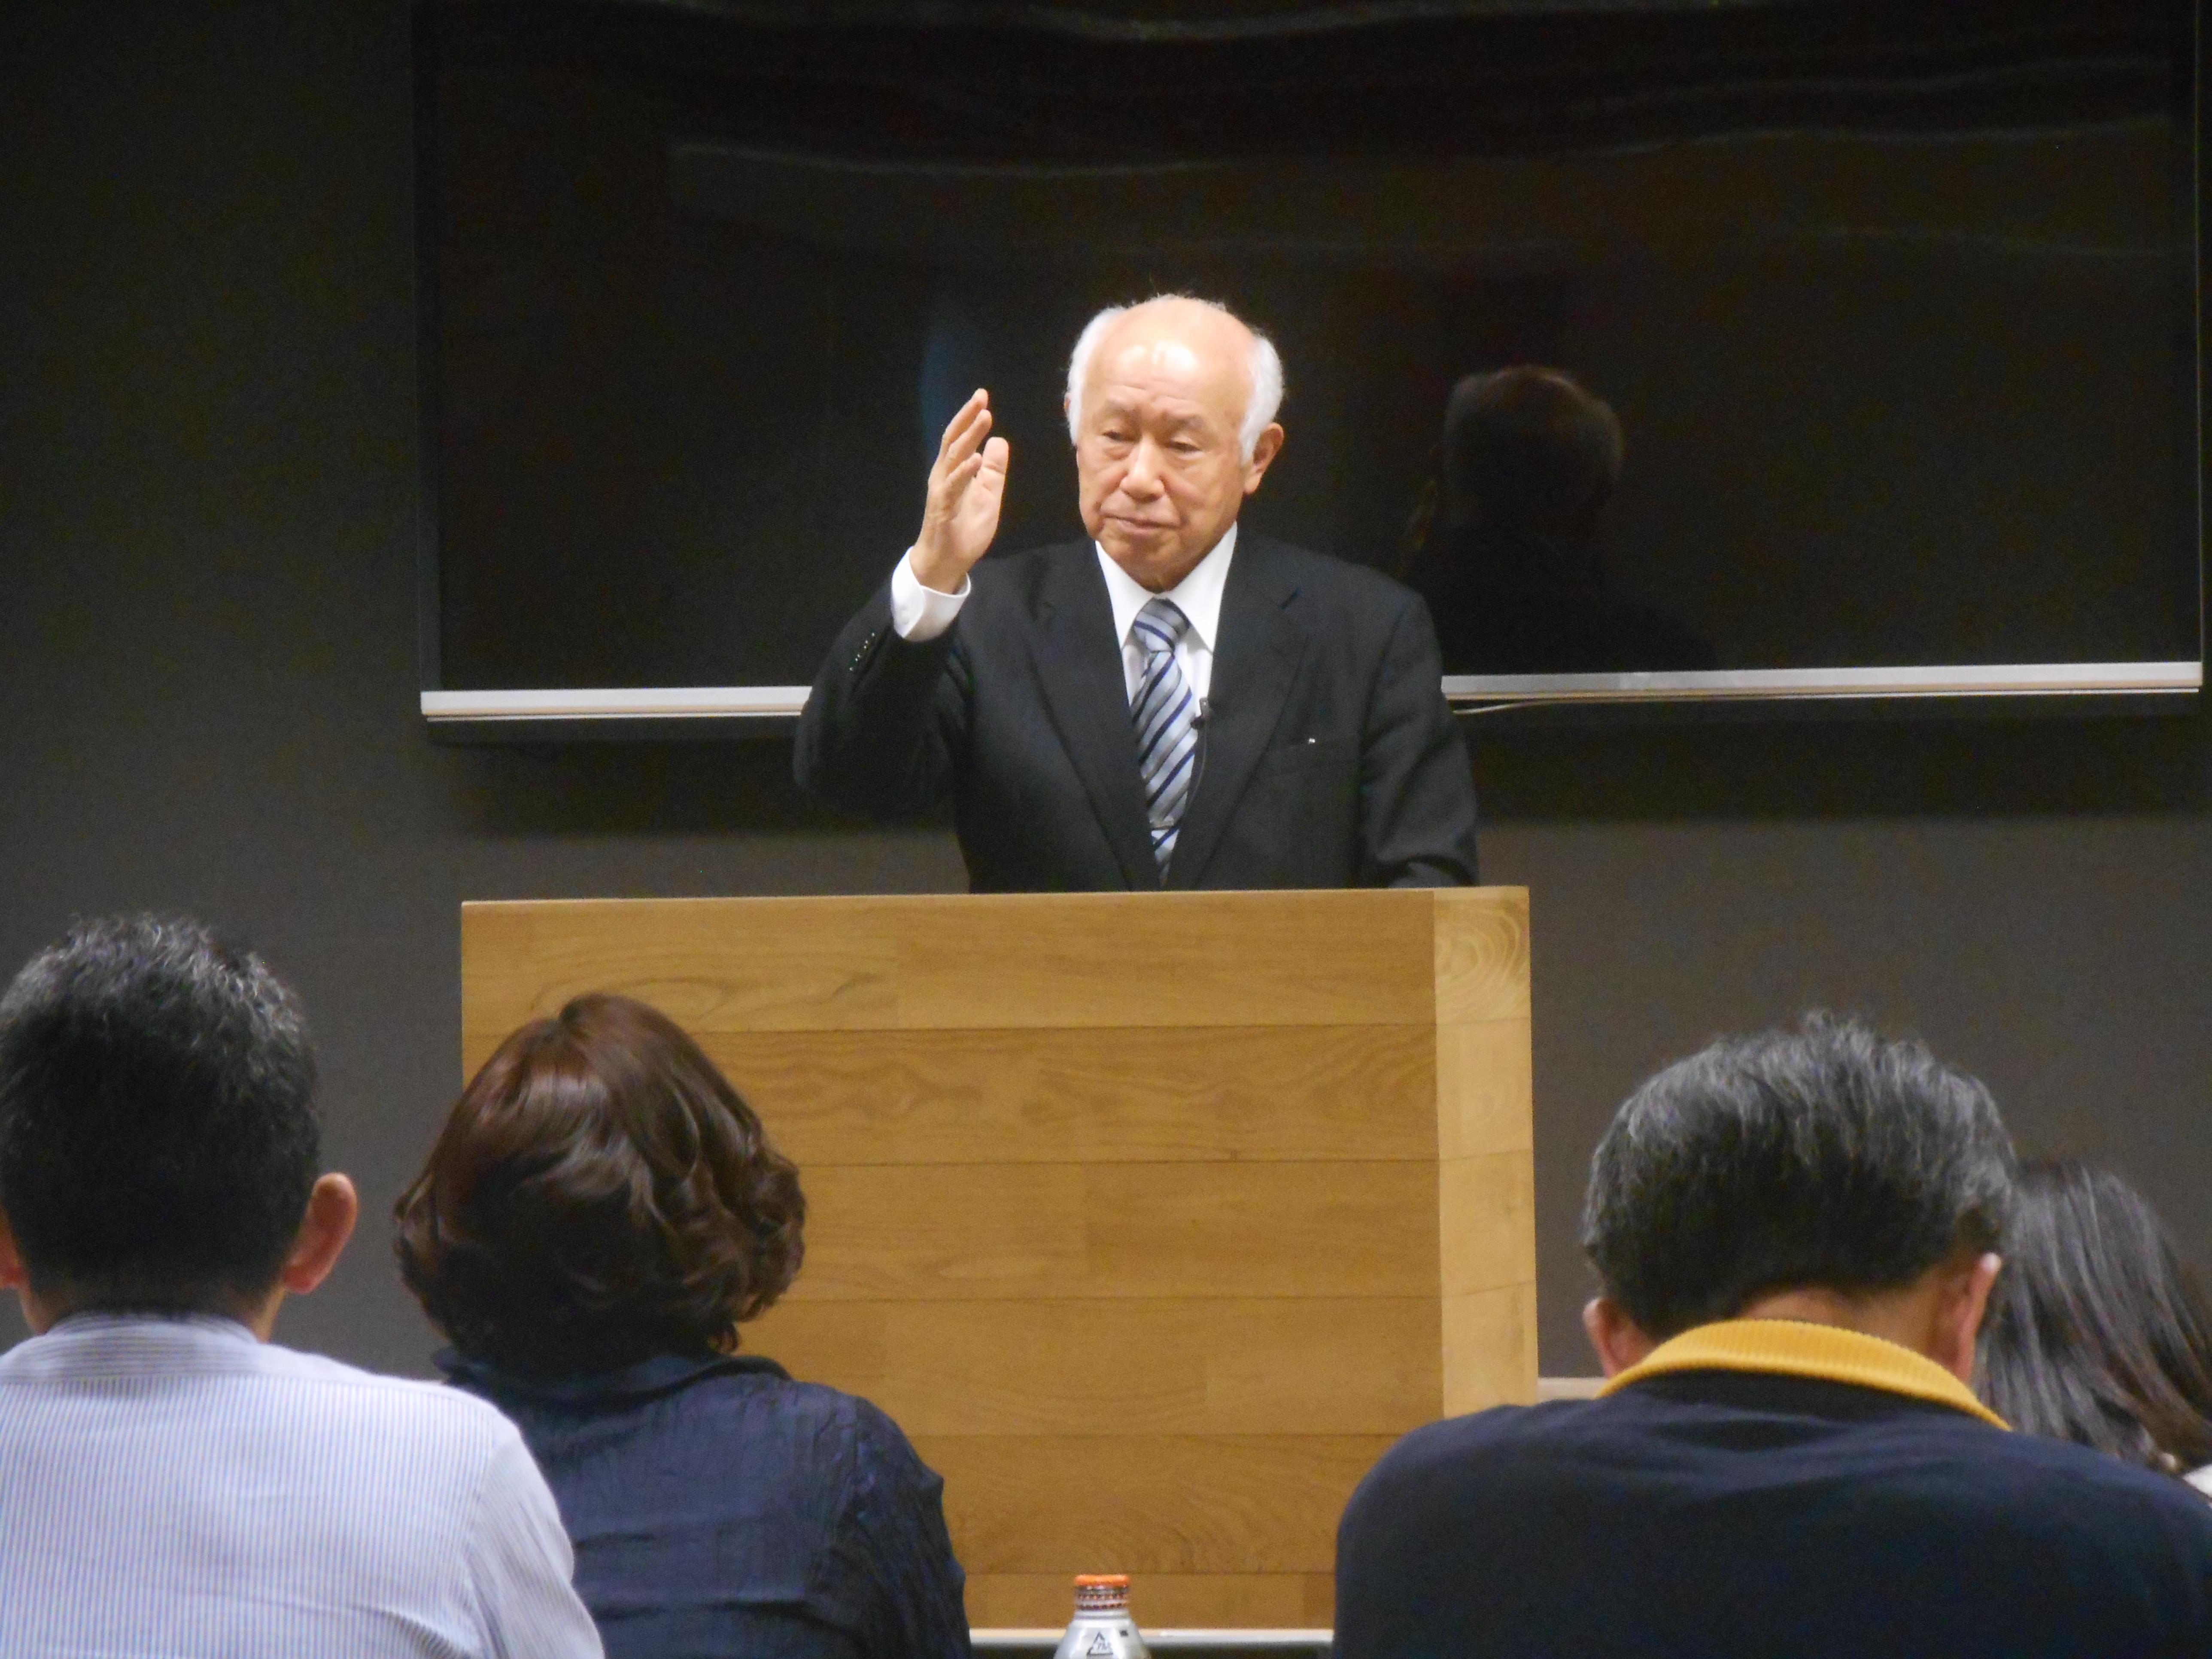 DSCN0441 - 4月1日東京思風塾の開催になります。